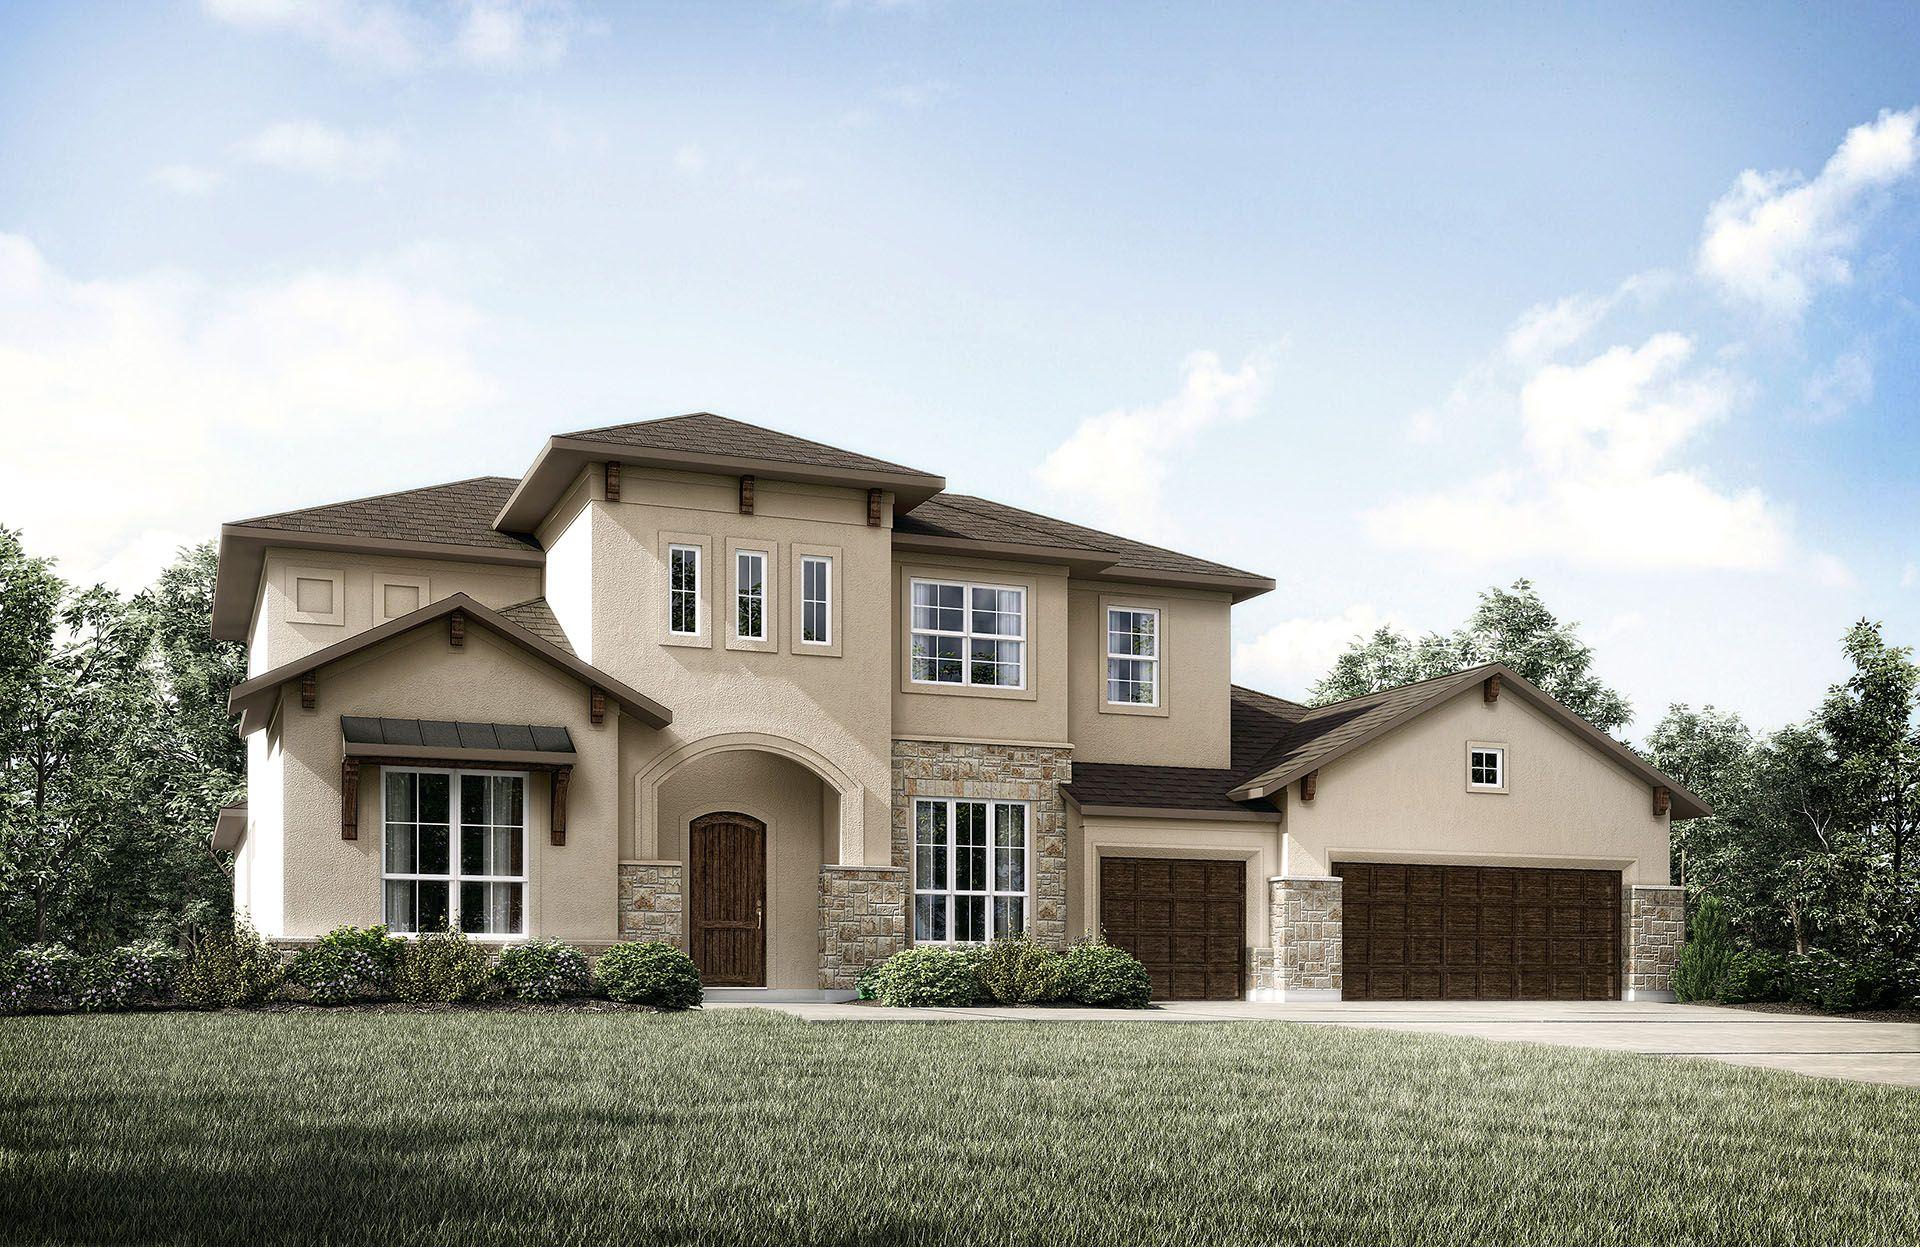 Single Family for Sale at Royal Brook At Kingwood - Colinas Iv 3306 Lockridge Harbor Lane Porter, Texas 77365 United States